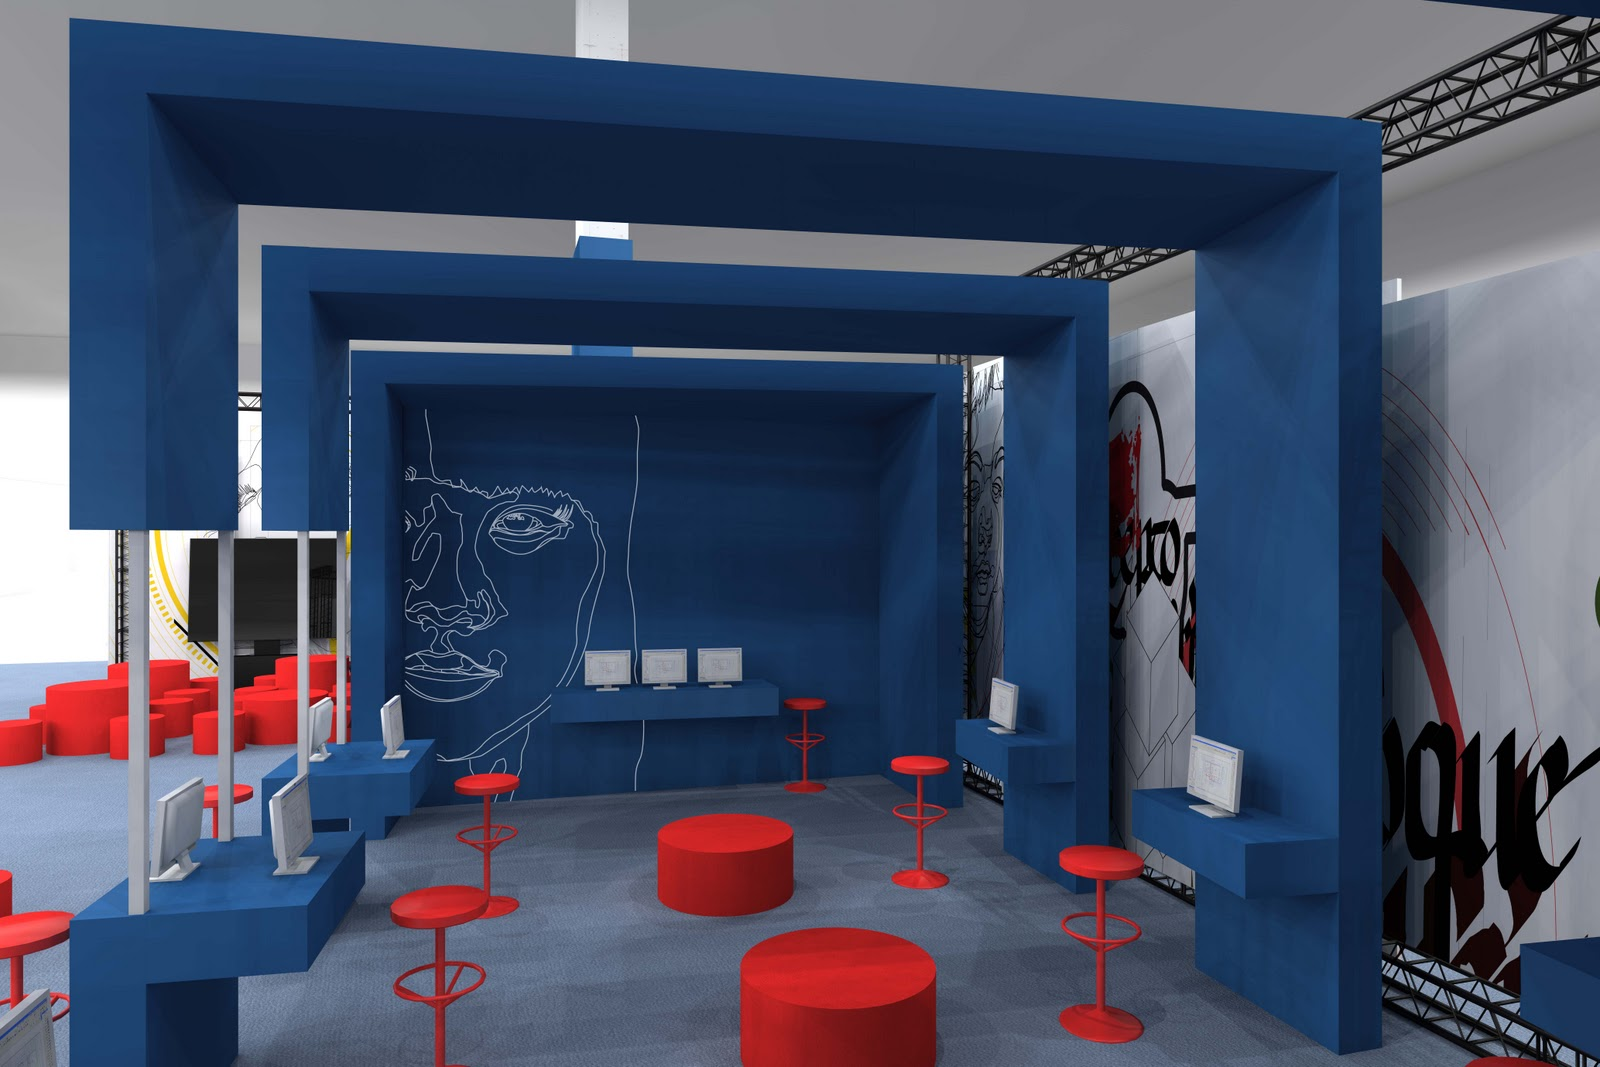 Aula2011byeasdvalencia infografias stand aula 2011 - Easd valencia ...